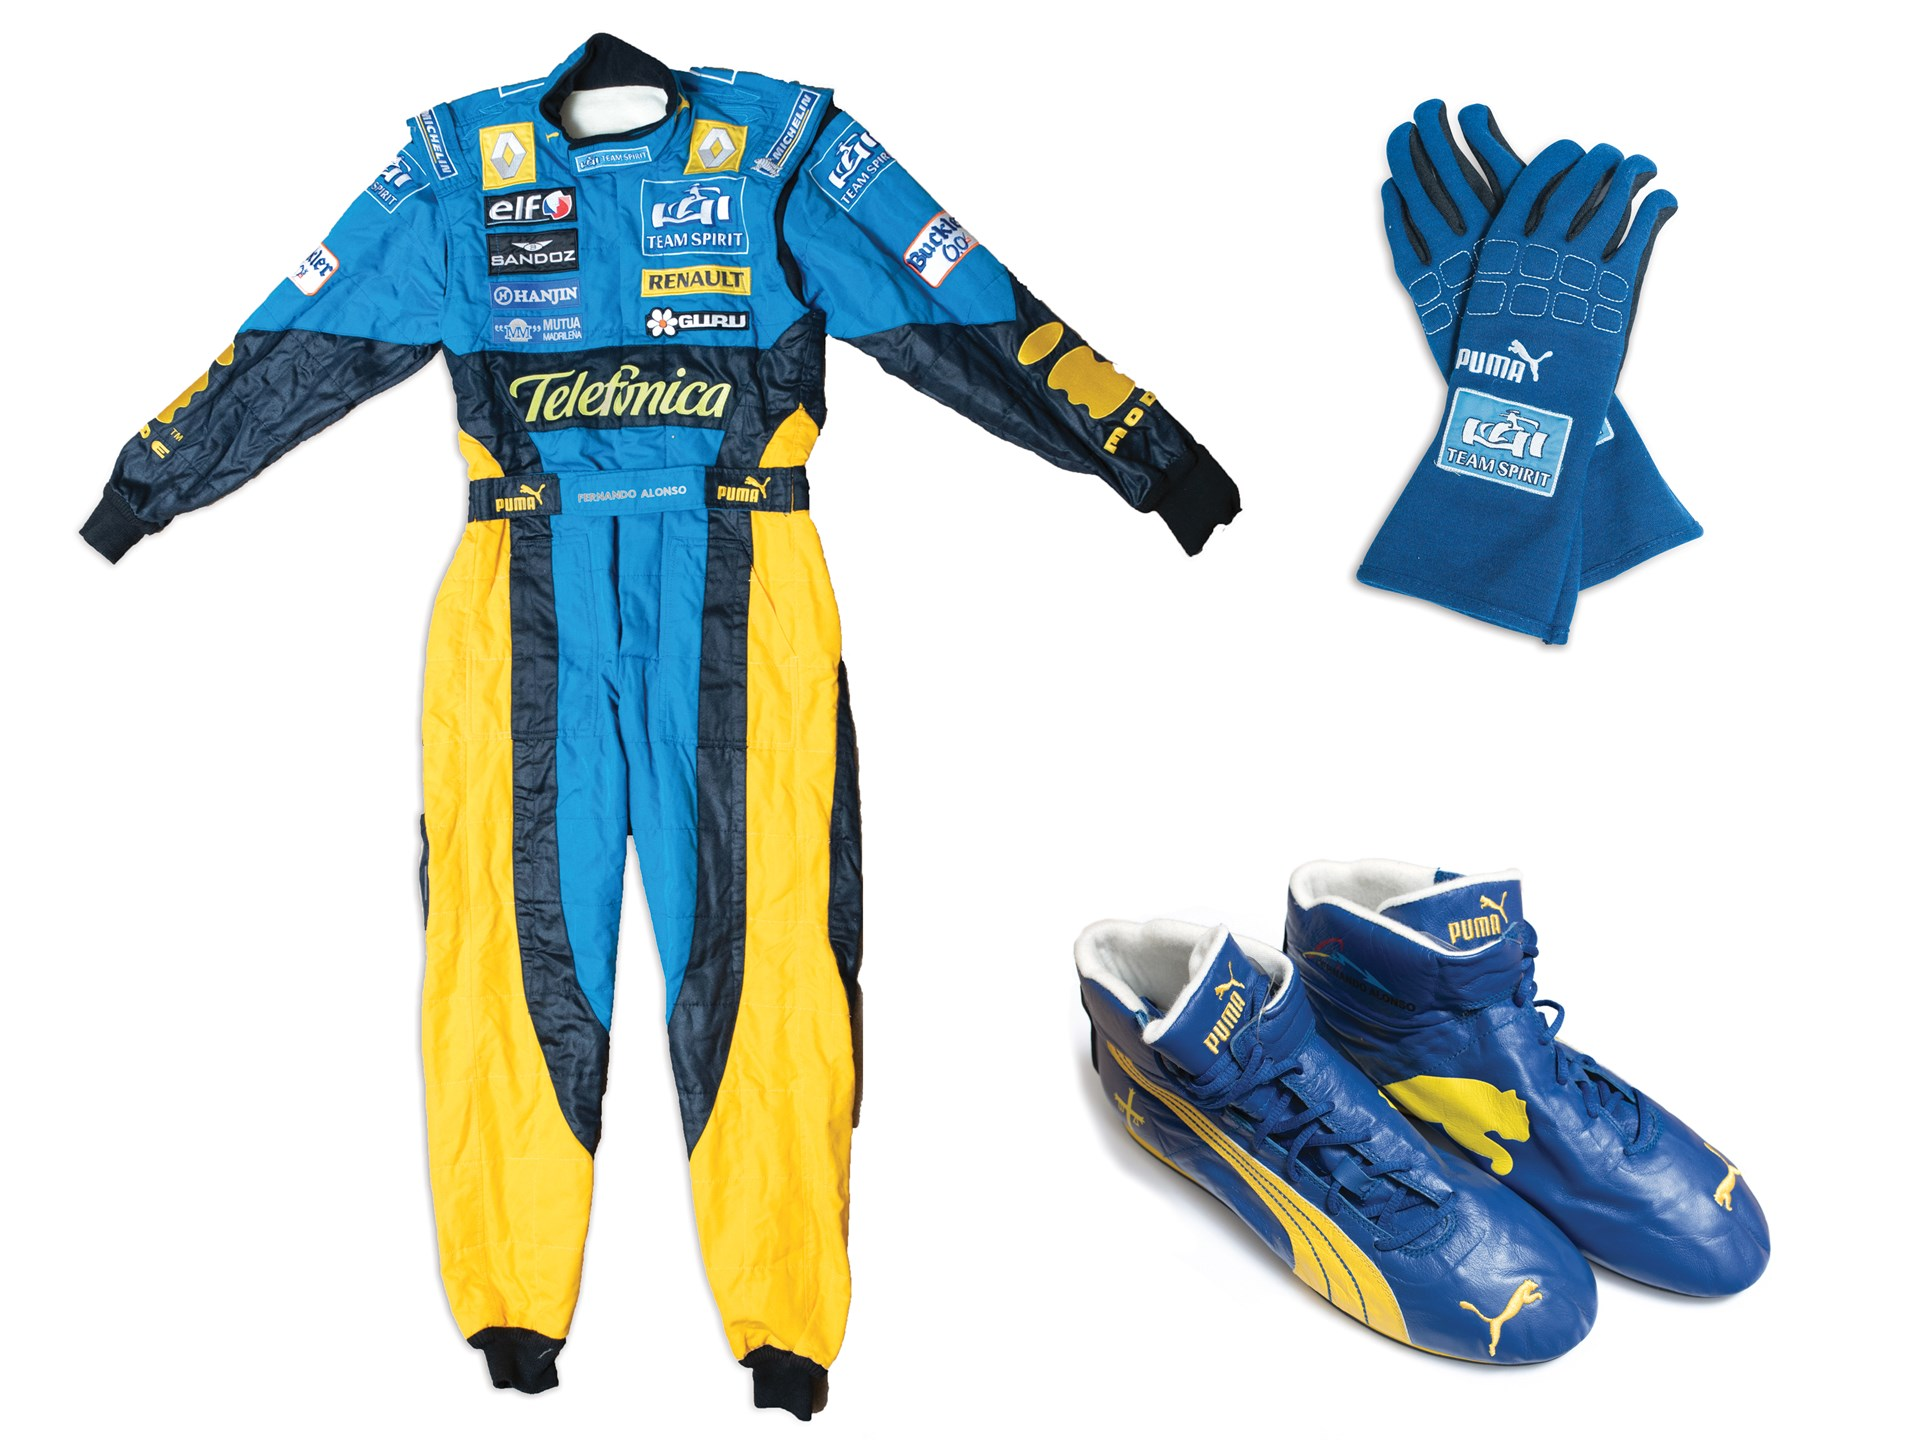 Fernando Alonso Renault Formula 1 Race Suit, Gloves & Boots, 2006